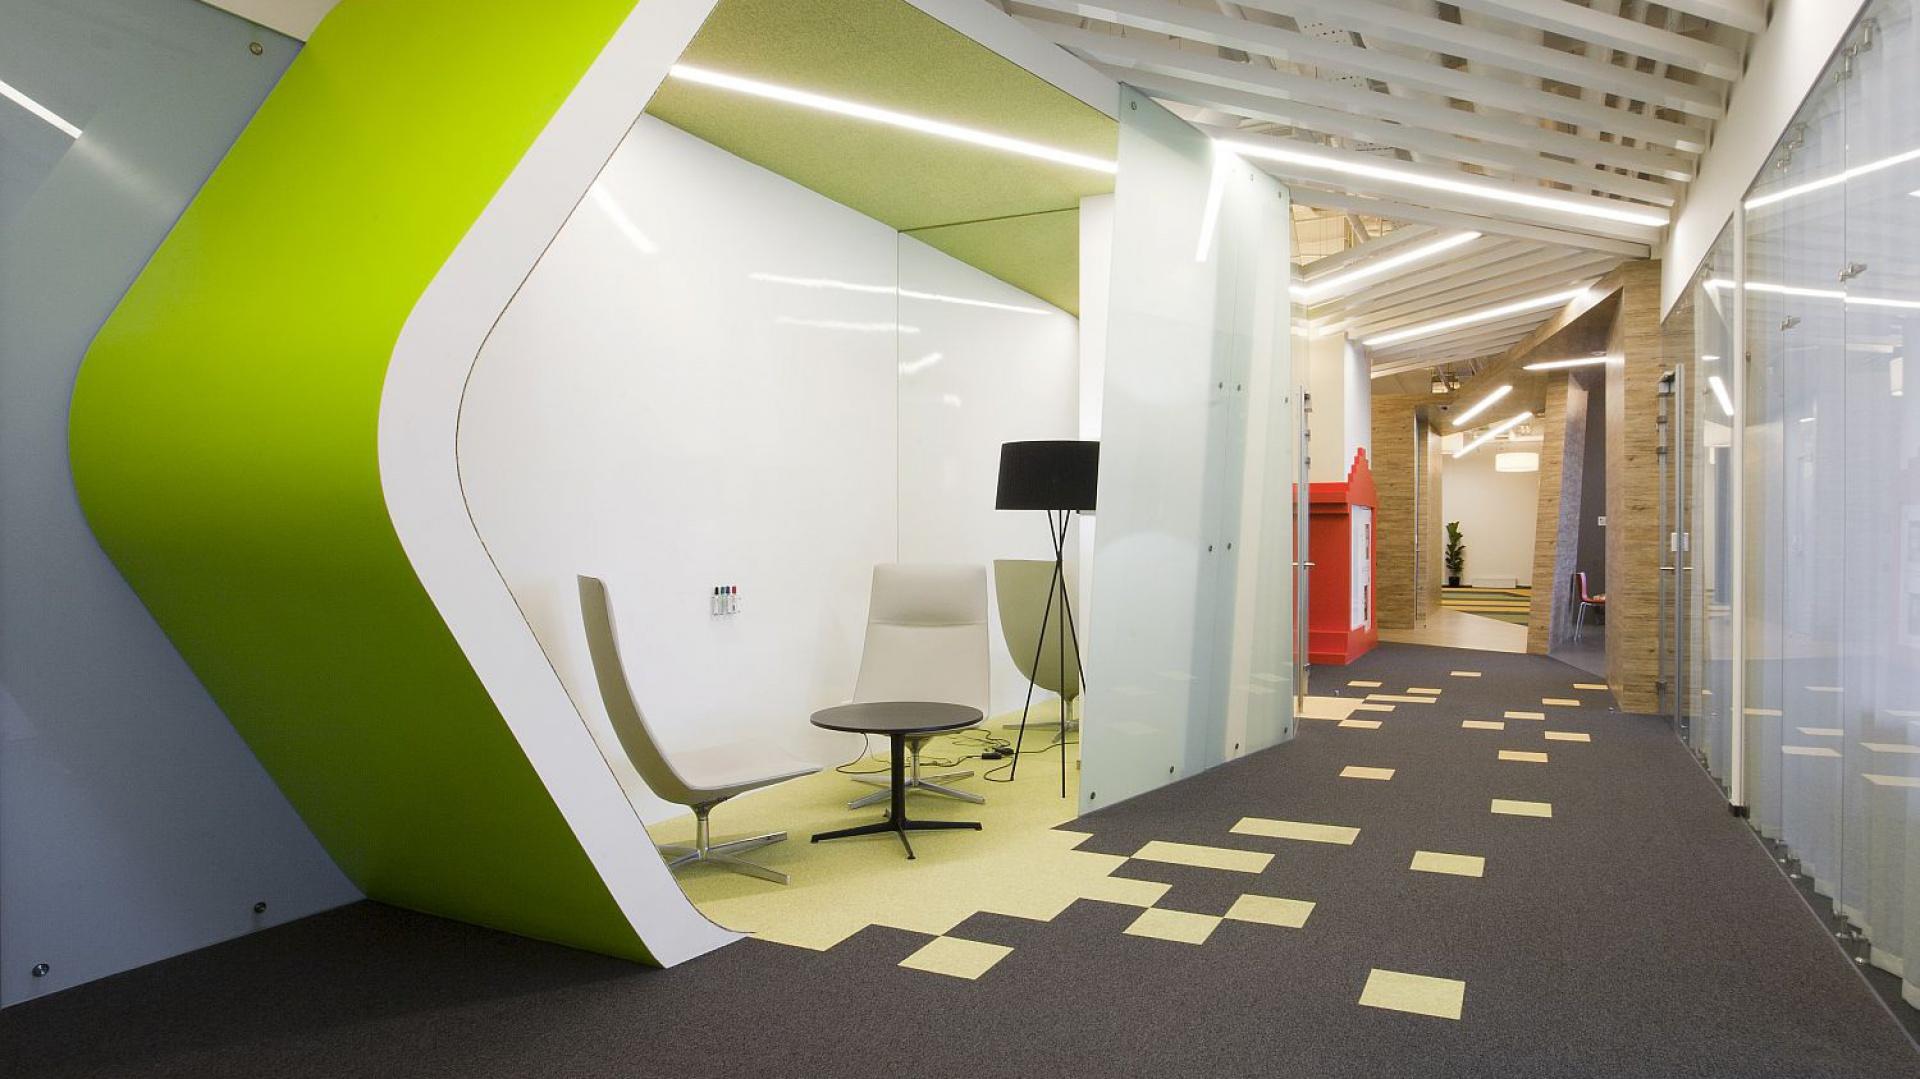 Biuro firmy Yandex w Petersburgu. Fot. Archiwum.